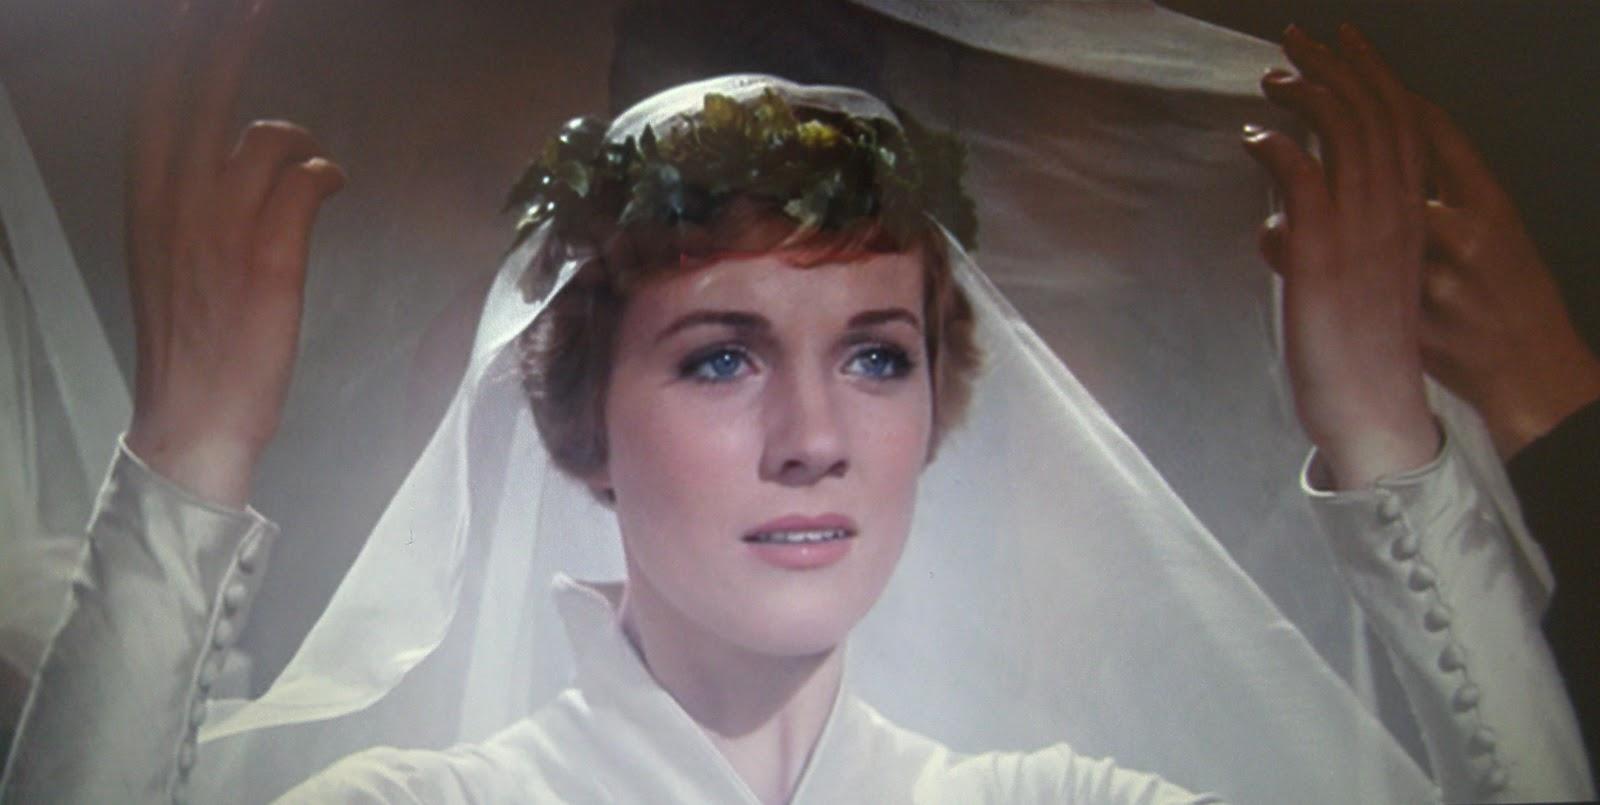 fashionephemera: waxing bridal for a moment: maria's wedding dress